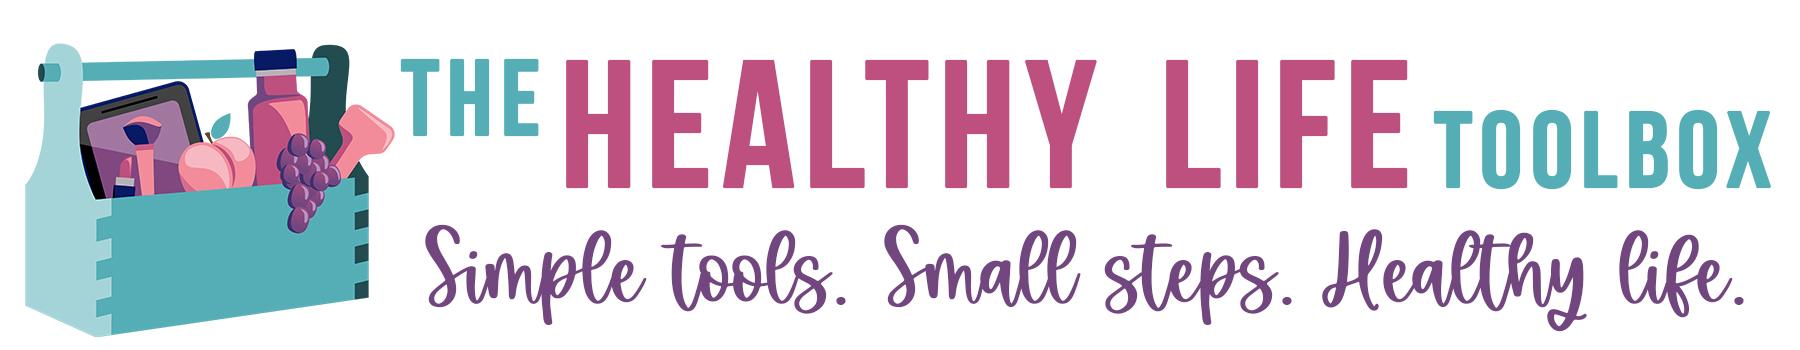 healthylifetoolbox.com